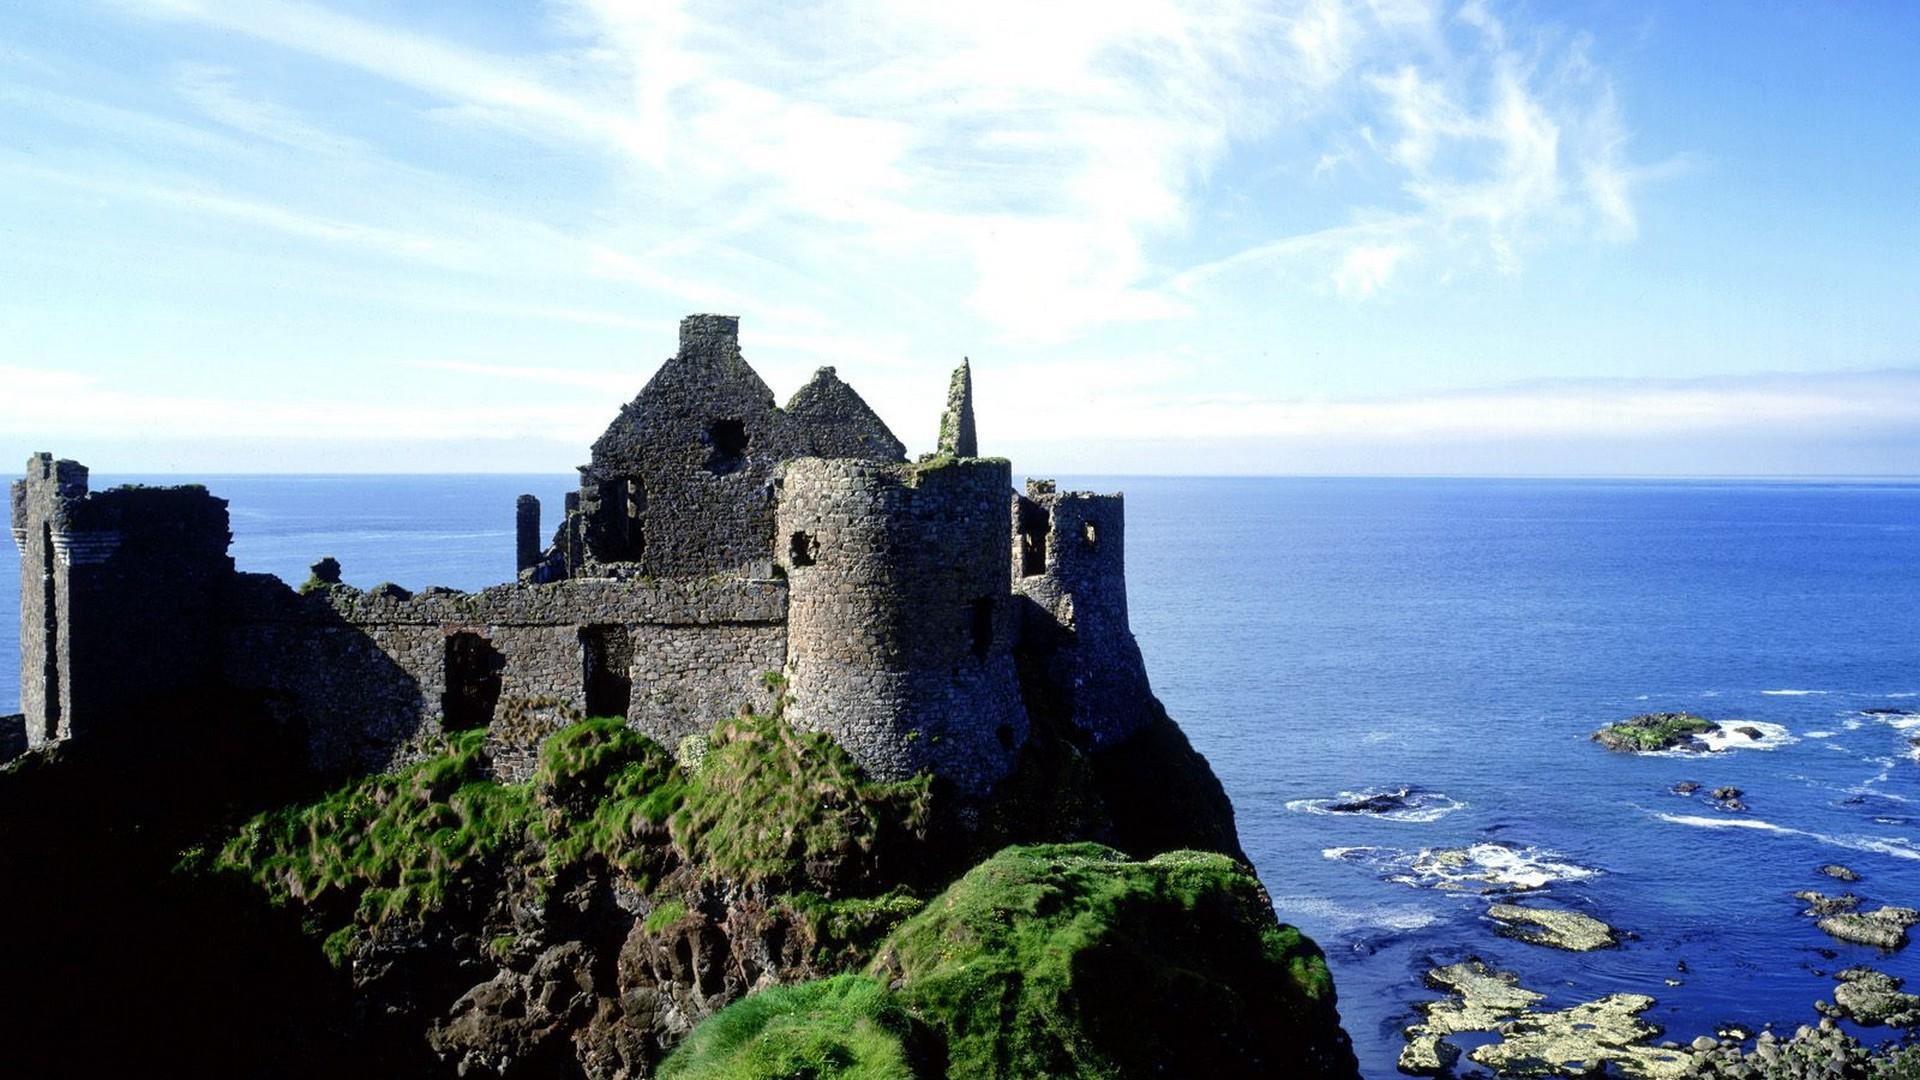 ruins-architecture-Ireland-dunluce-castle-x-wallpaper-wp428875-1